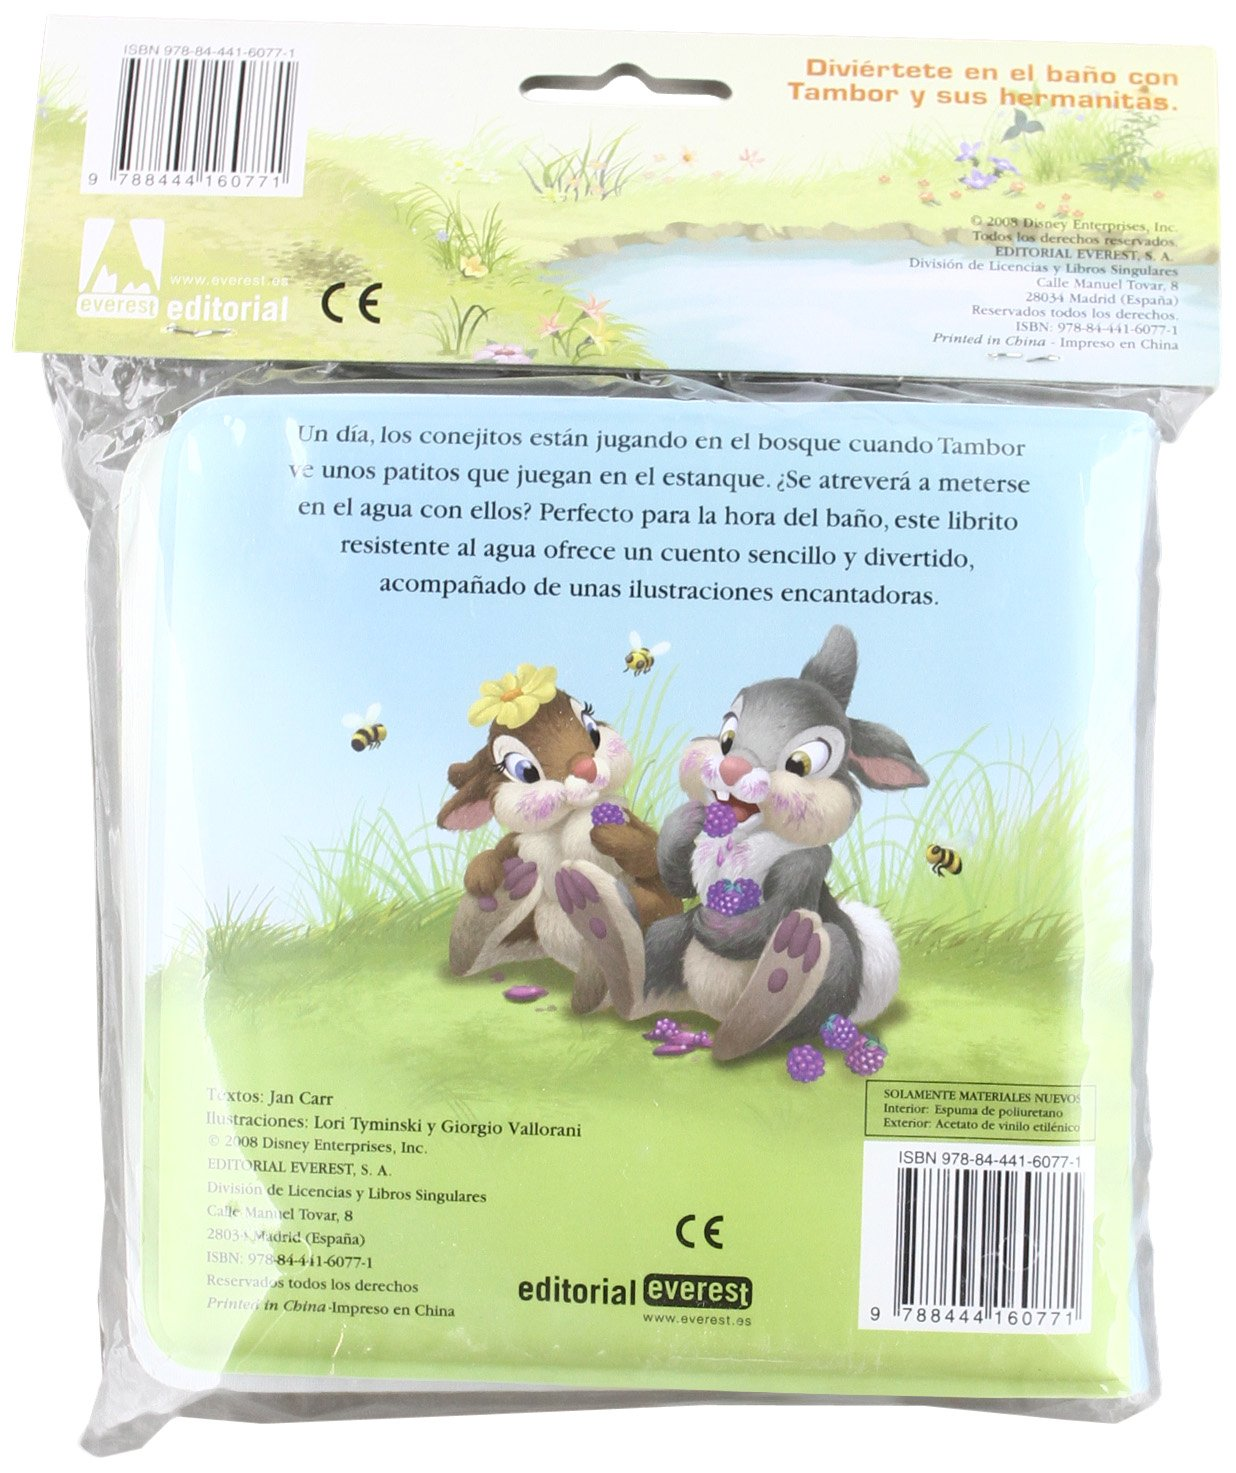 Al agua con Tambor Tambor y su familia / Libros singulares: Amazon.es: Walt Disney Company, Carr Jan, Vallorani Giorgio, Tyminski Lori, Alonso Mendoza ...